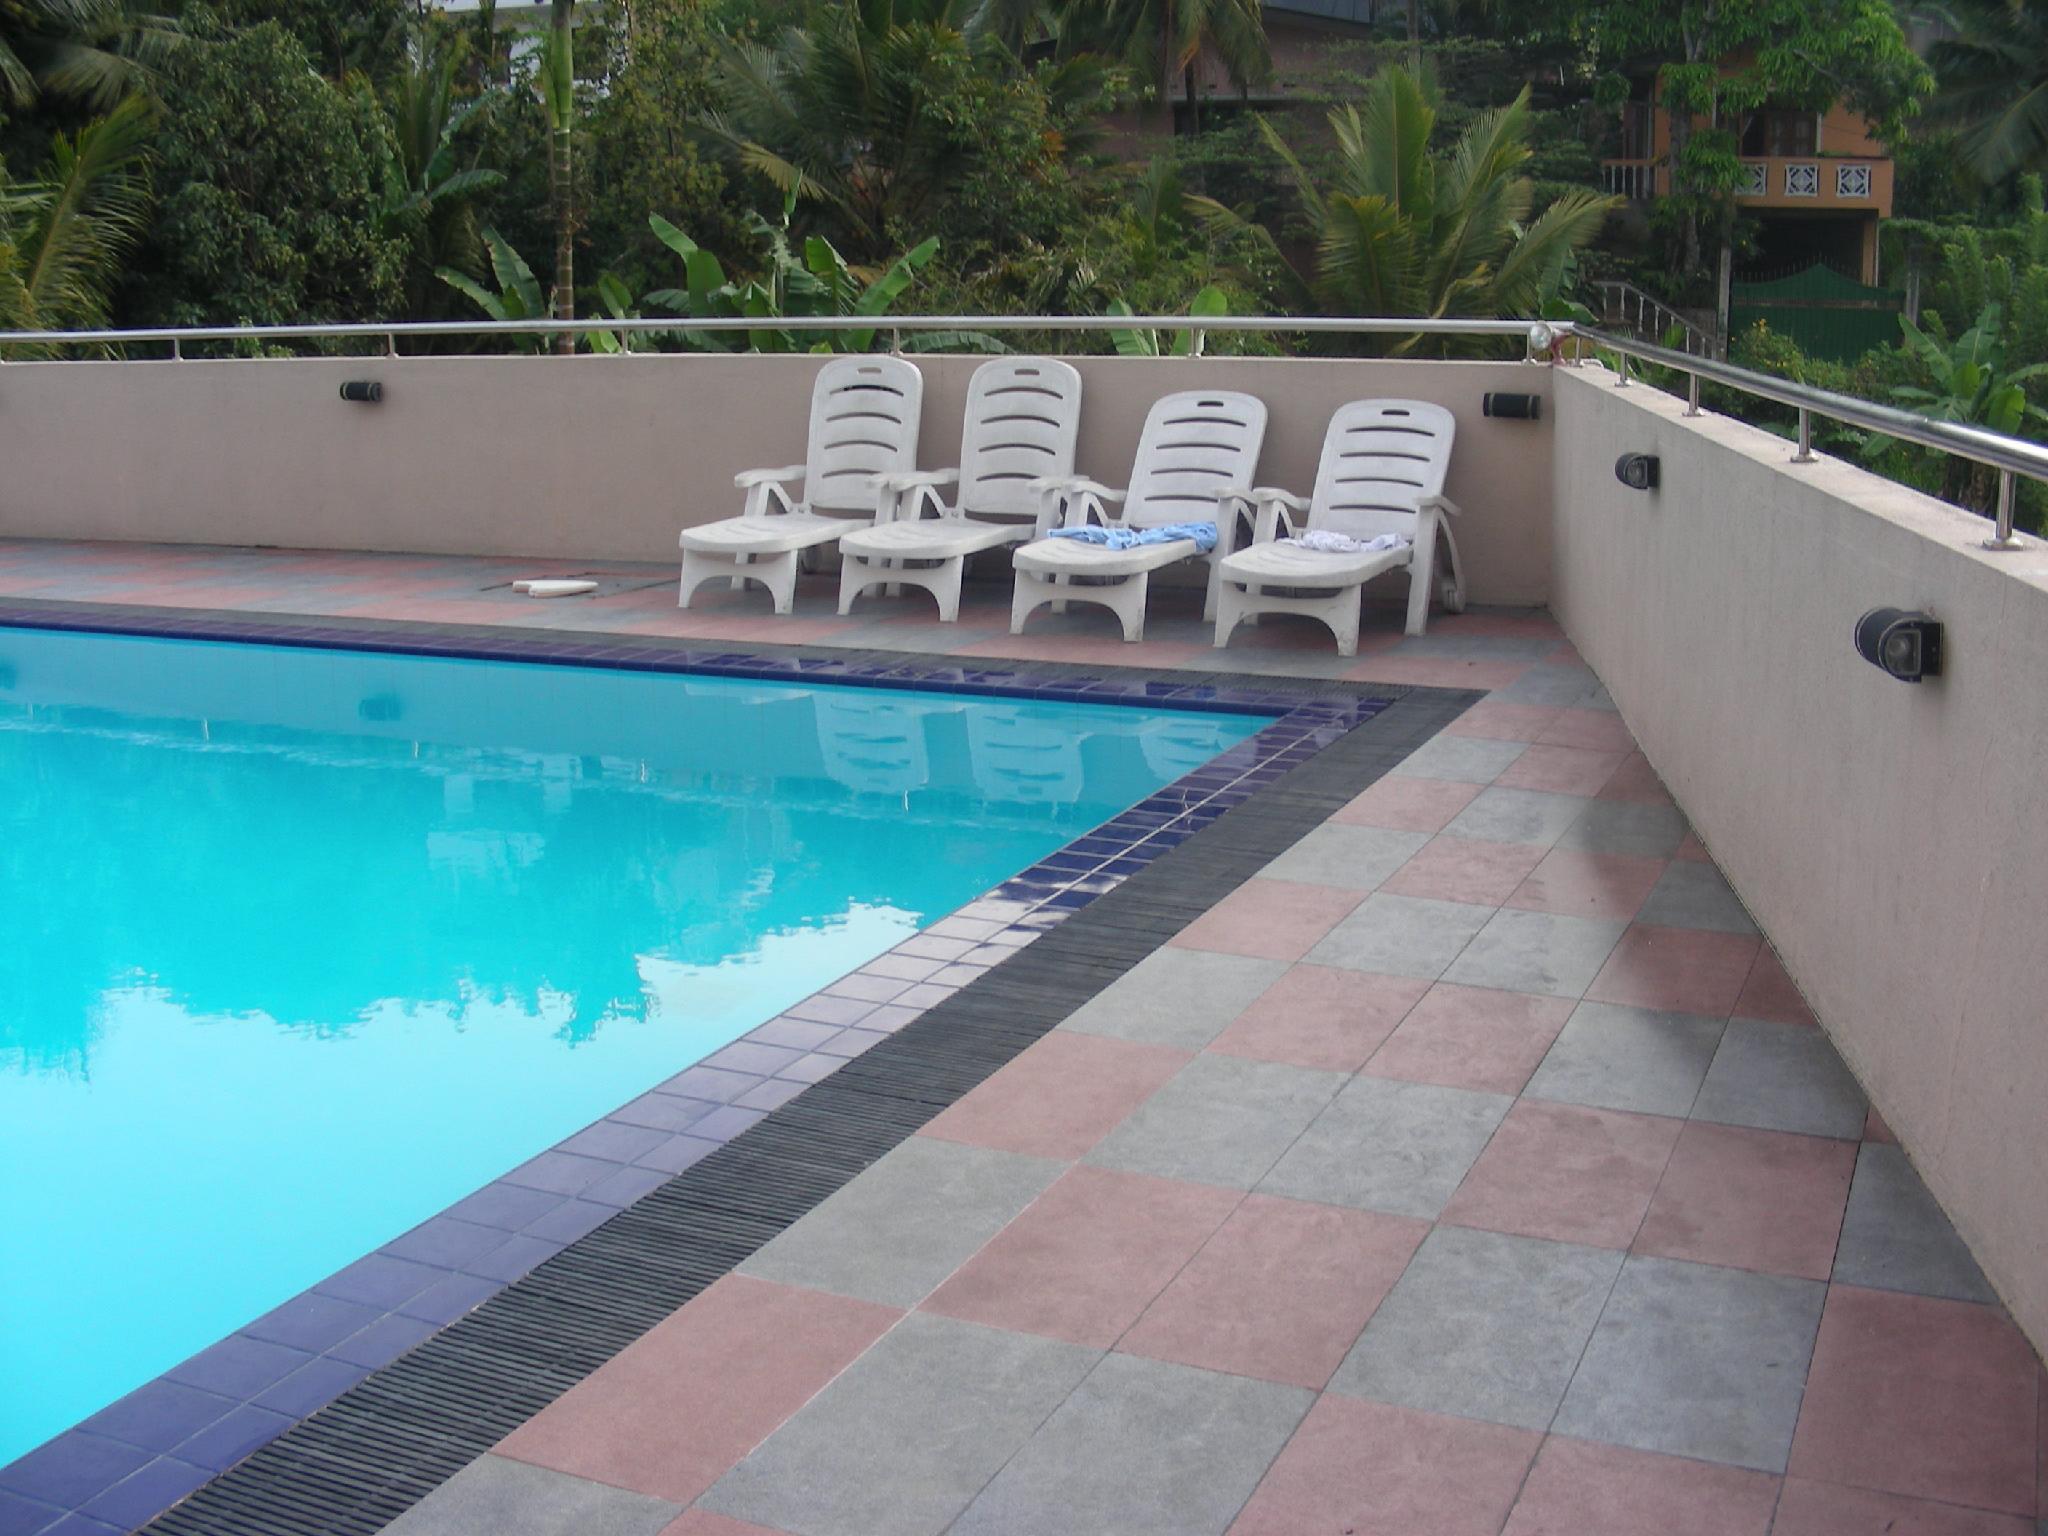 Devon Hotel Kandy Kandy Central Sri Lanka Hotels Hotel Reservations For Hotels In Sri